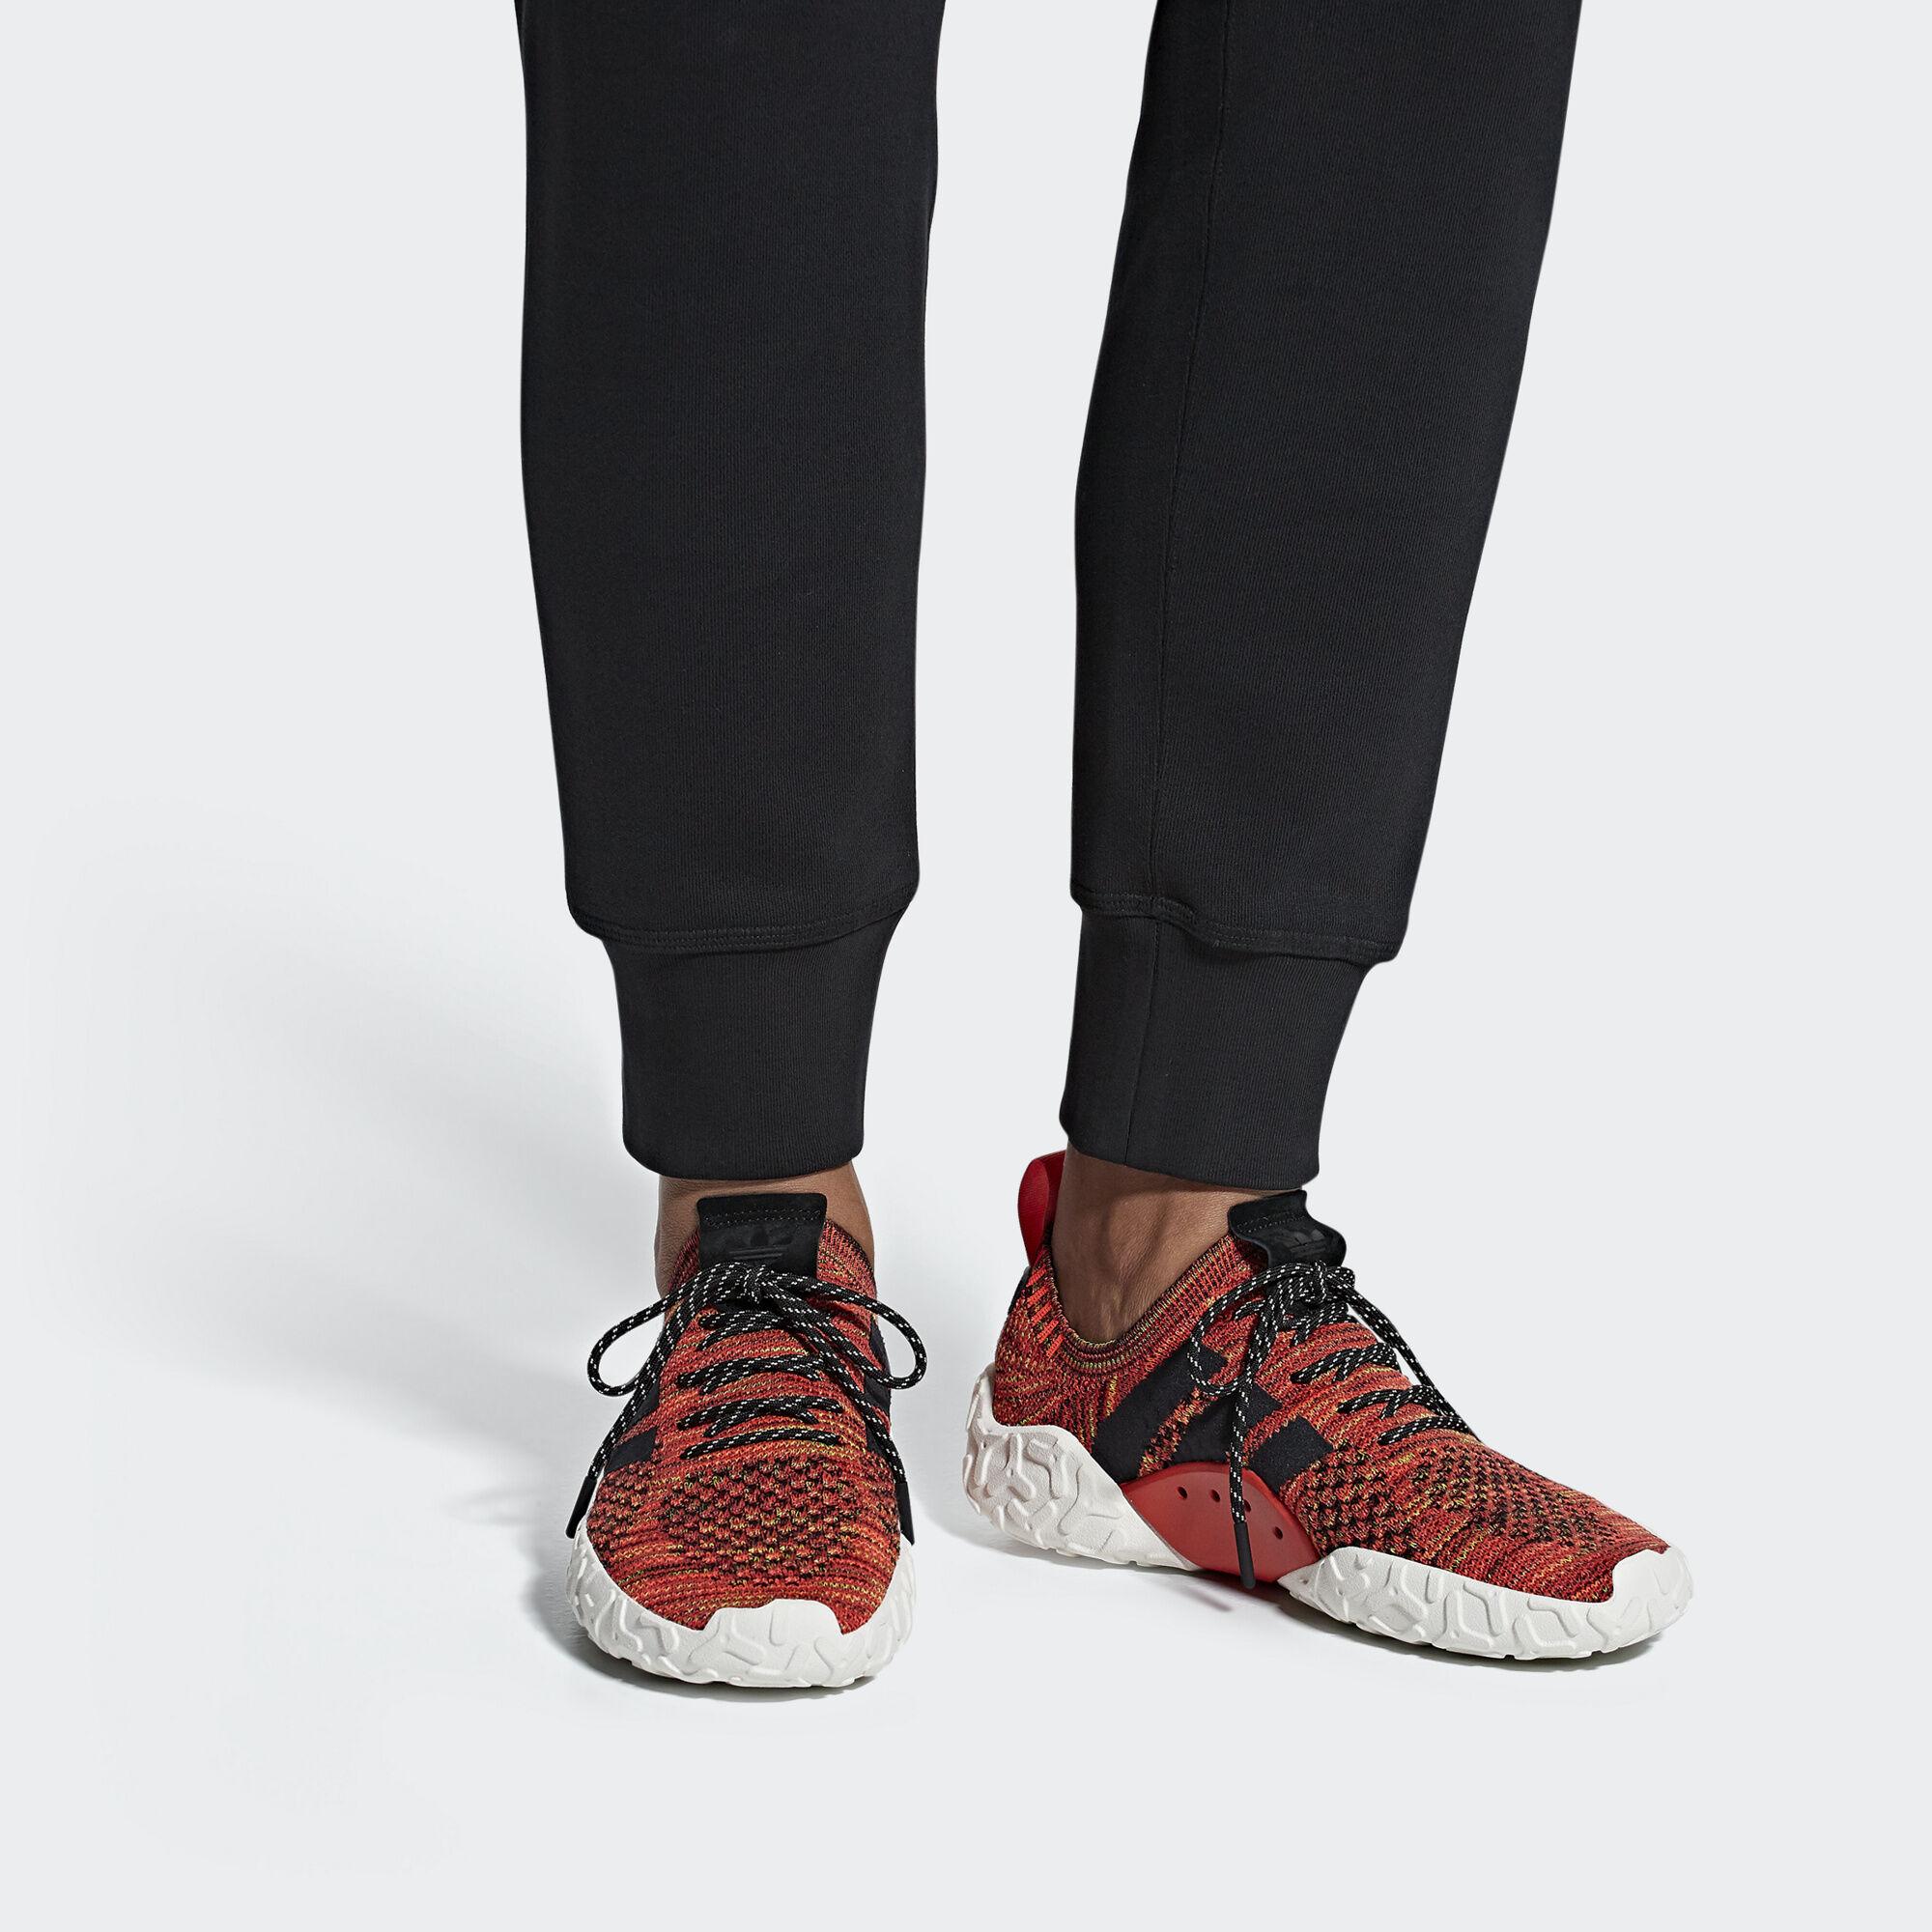 online retailer 31803 b7780 adidas F 22 Primeknit Shoes - Orange   adidas Ireland